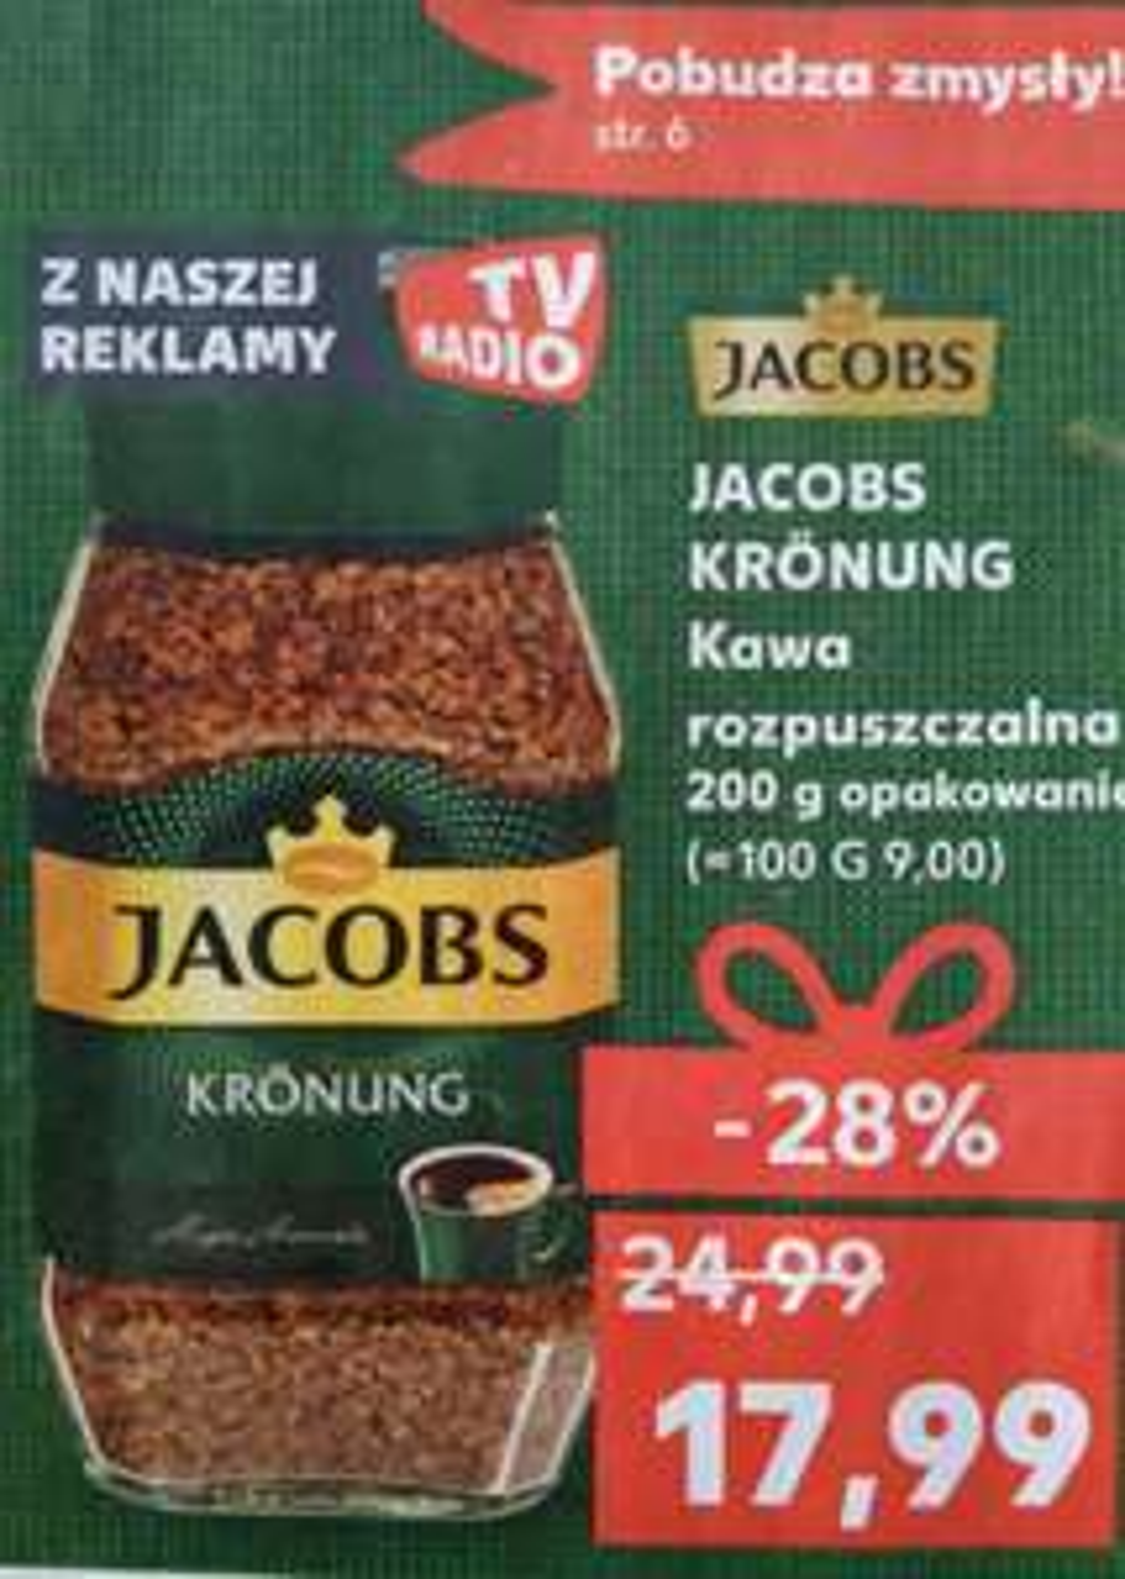 Jacobs Kronung 200g Kaufland